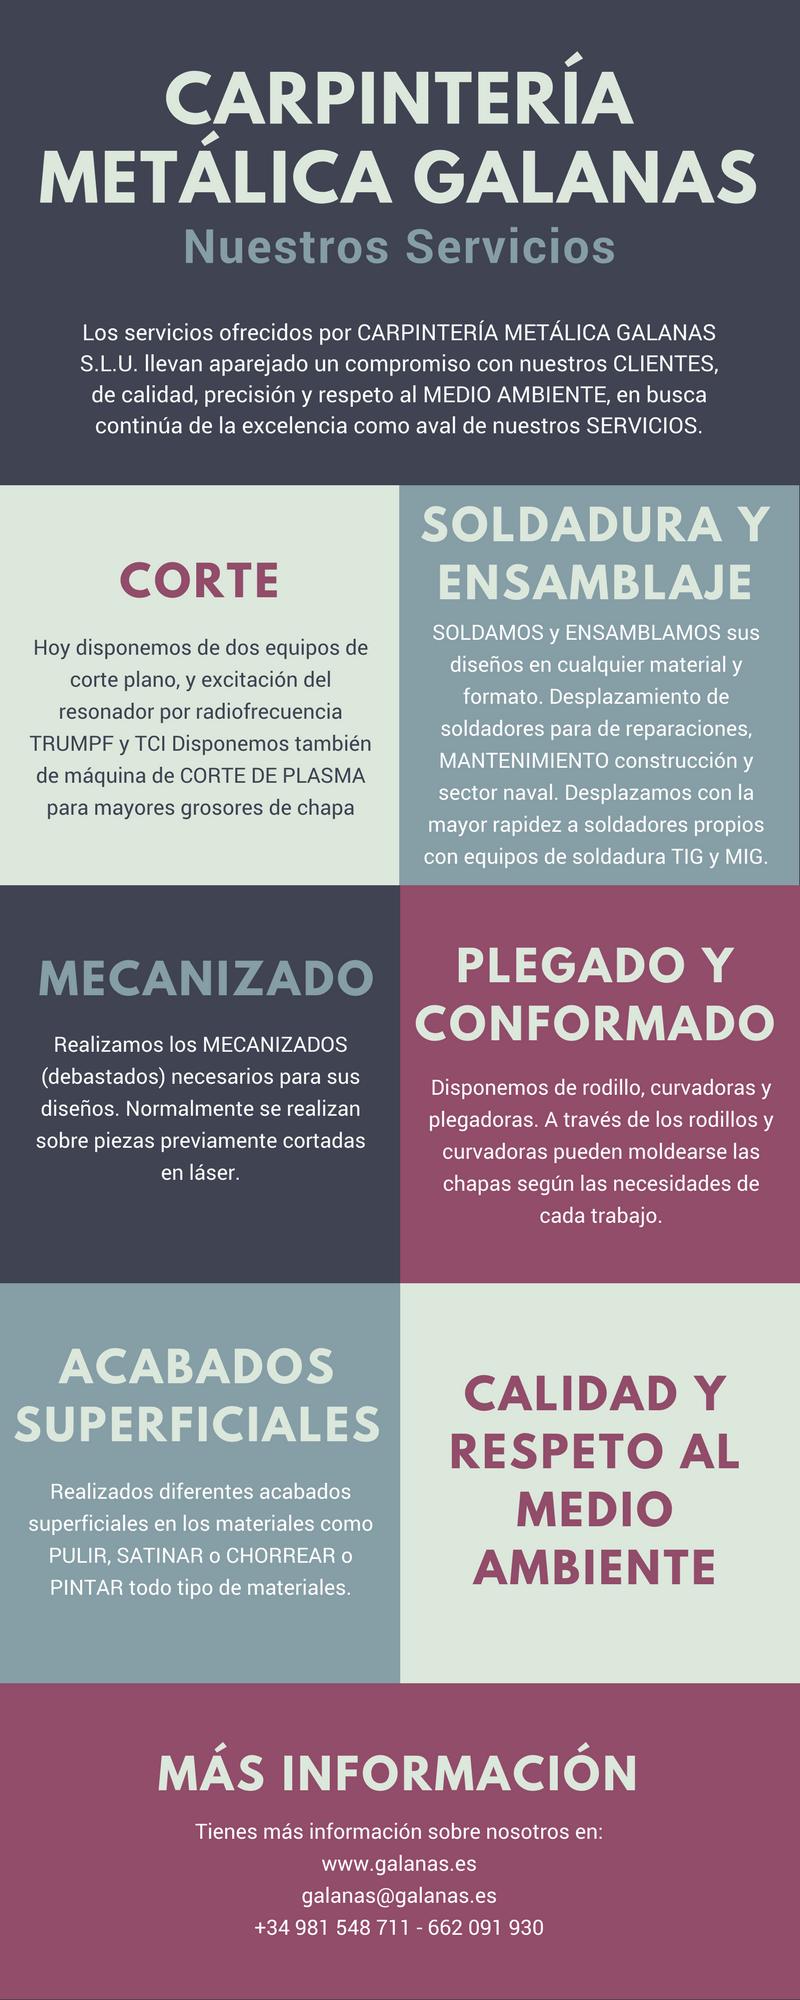 CARPINTERIA METÁLICA GALANAS - SERVICIOS QUE OFRECEMOS